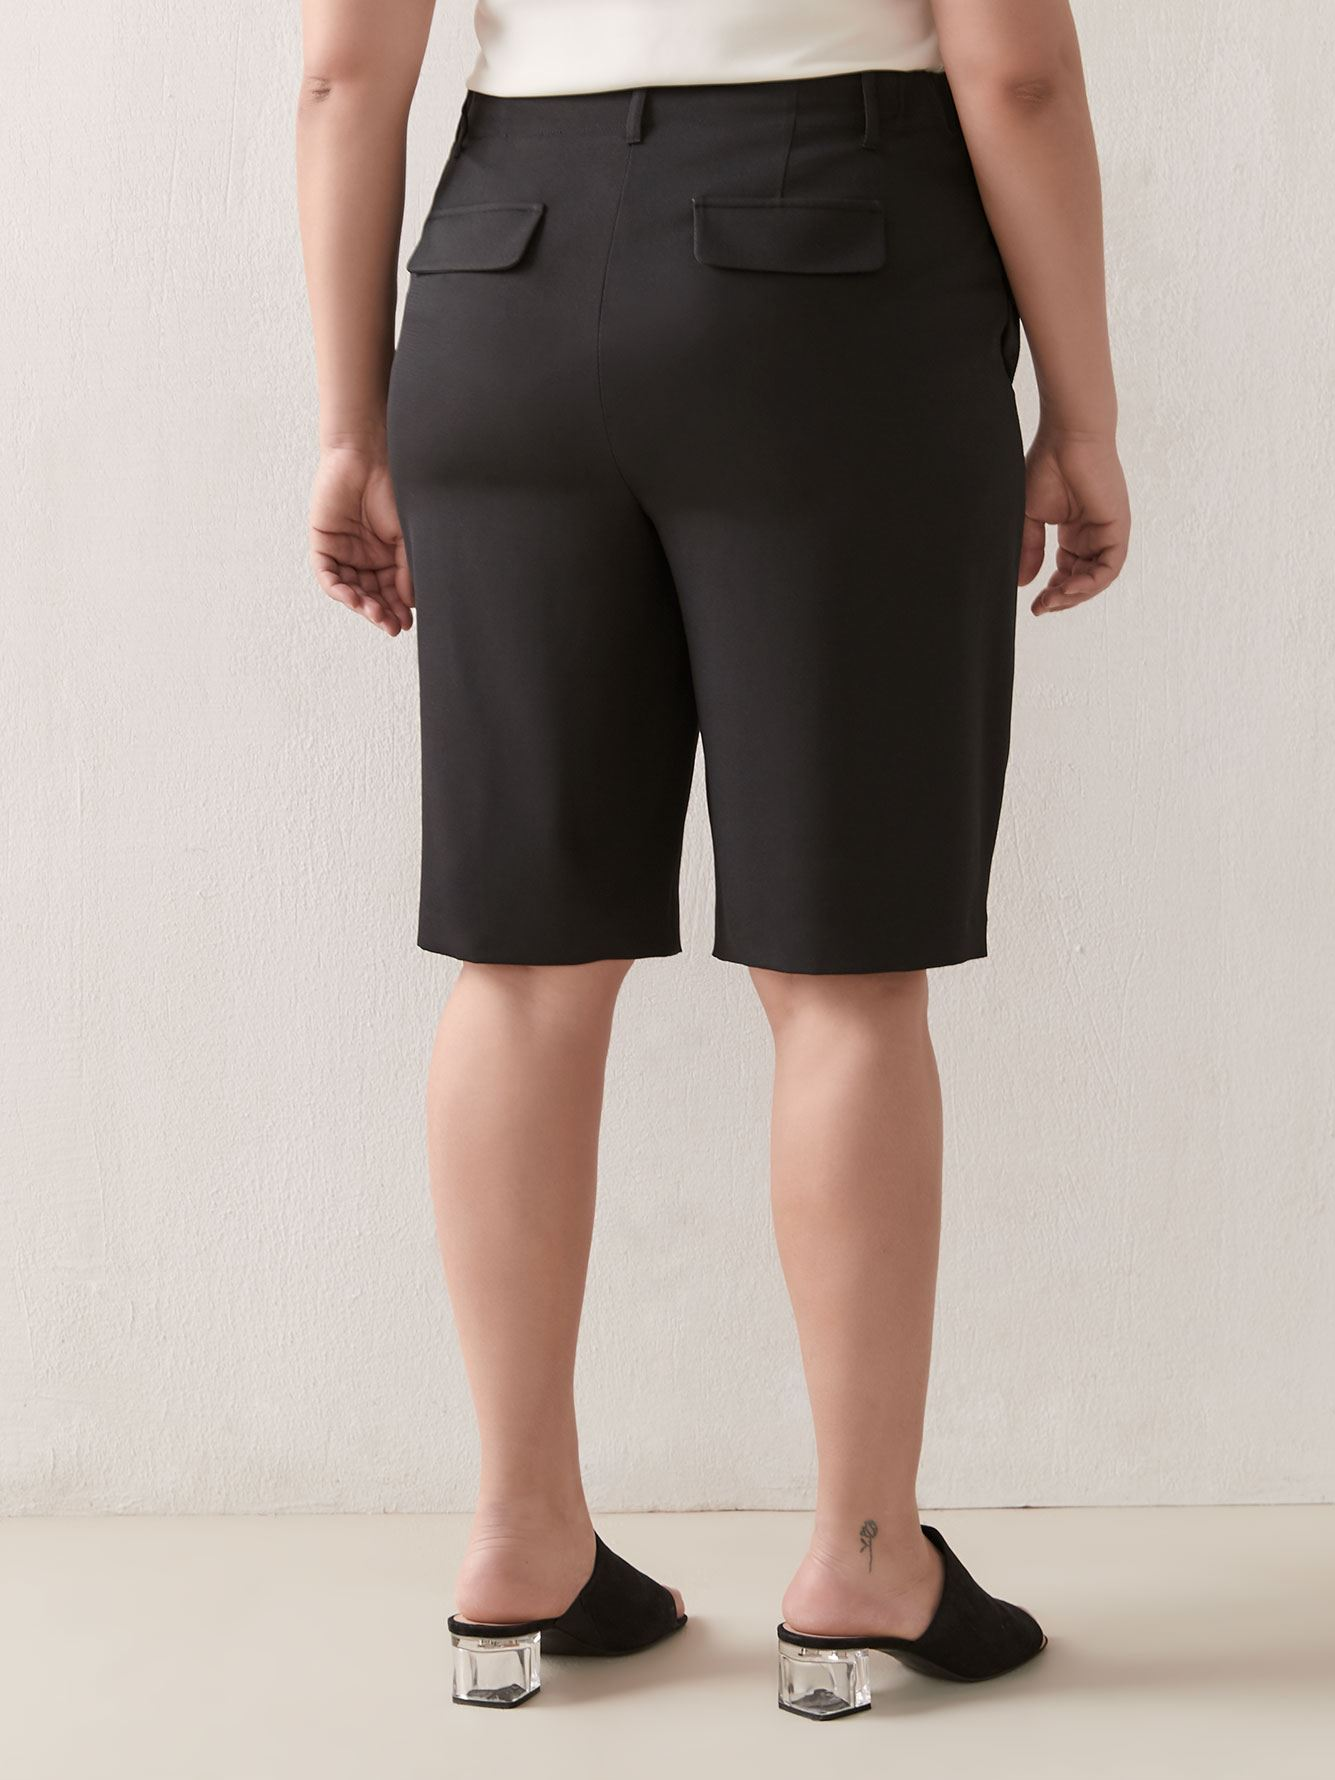 Wide Leg Bermuda Short - Addition Elle